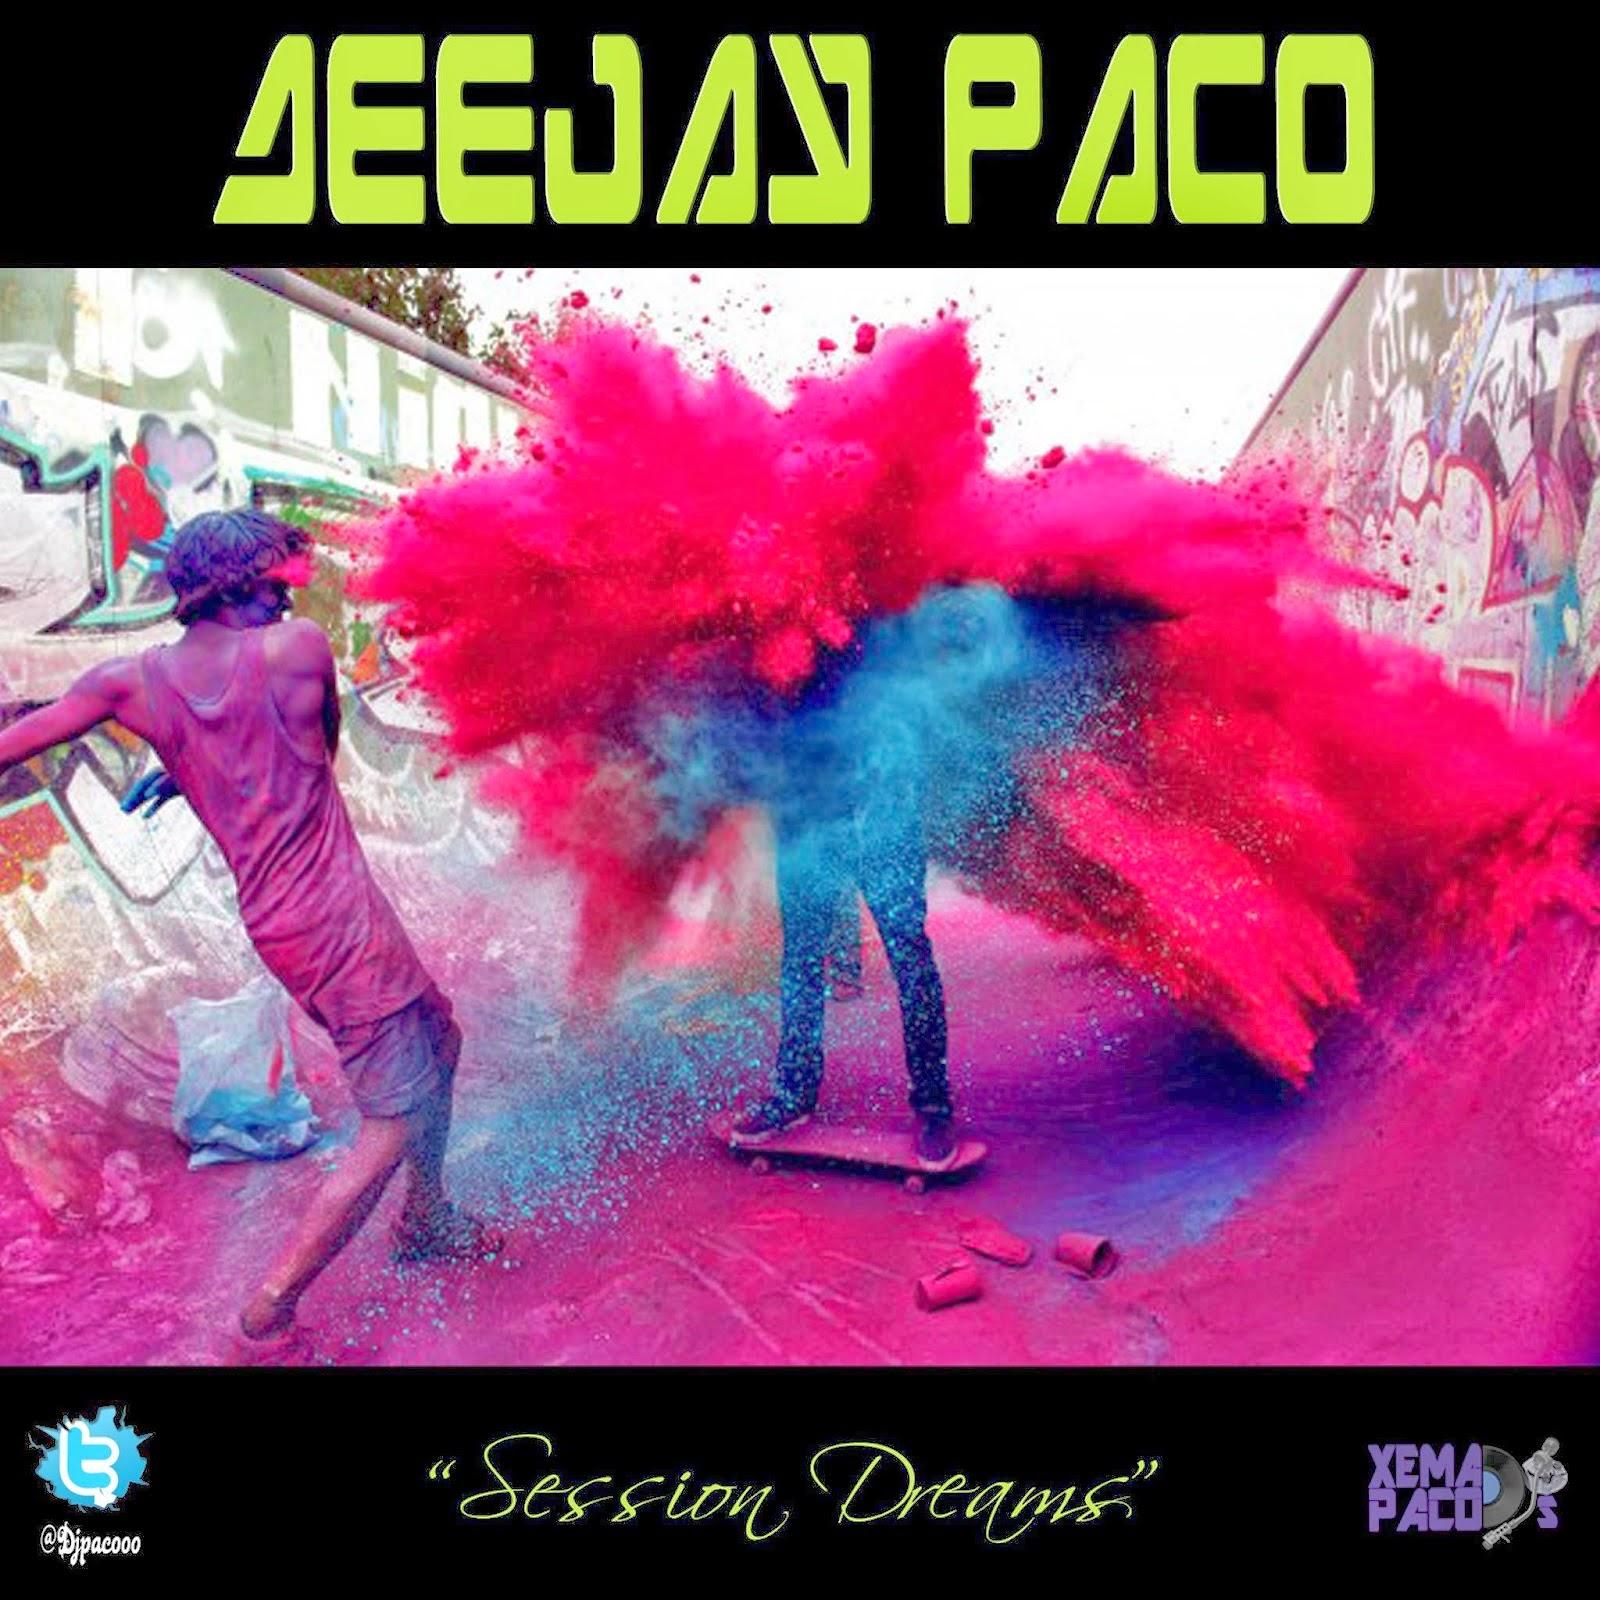 http://www.mediafire.com/download/52ujn8ltvctc4gz/Deejay+Paco+Session+Dreams+2014.rar